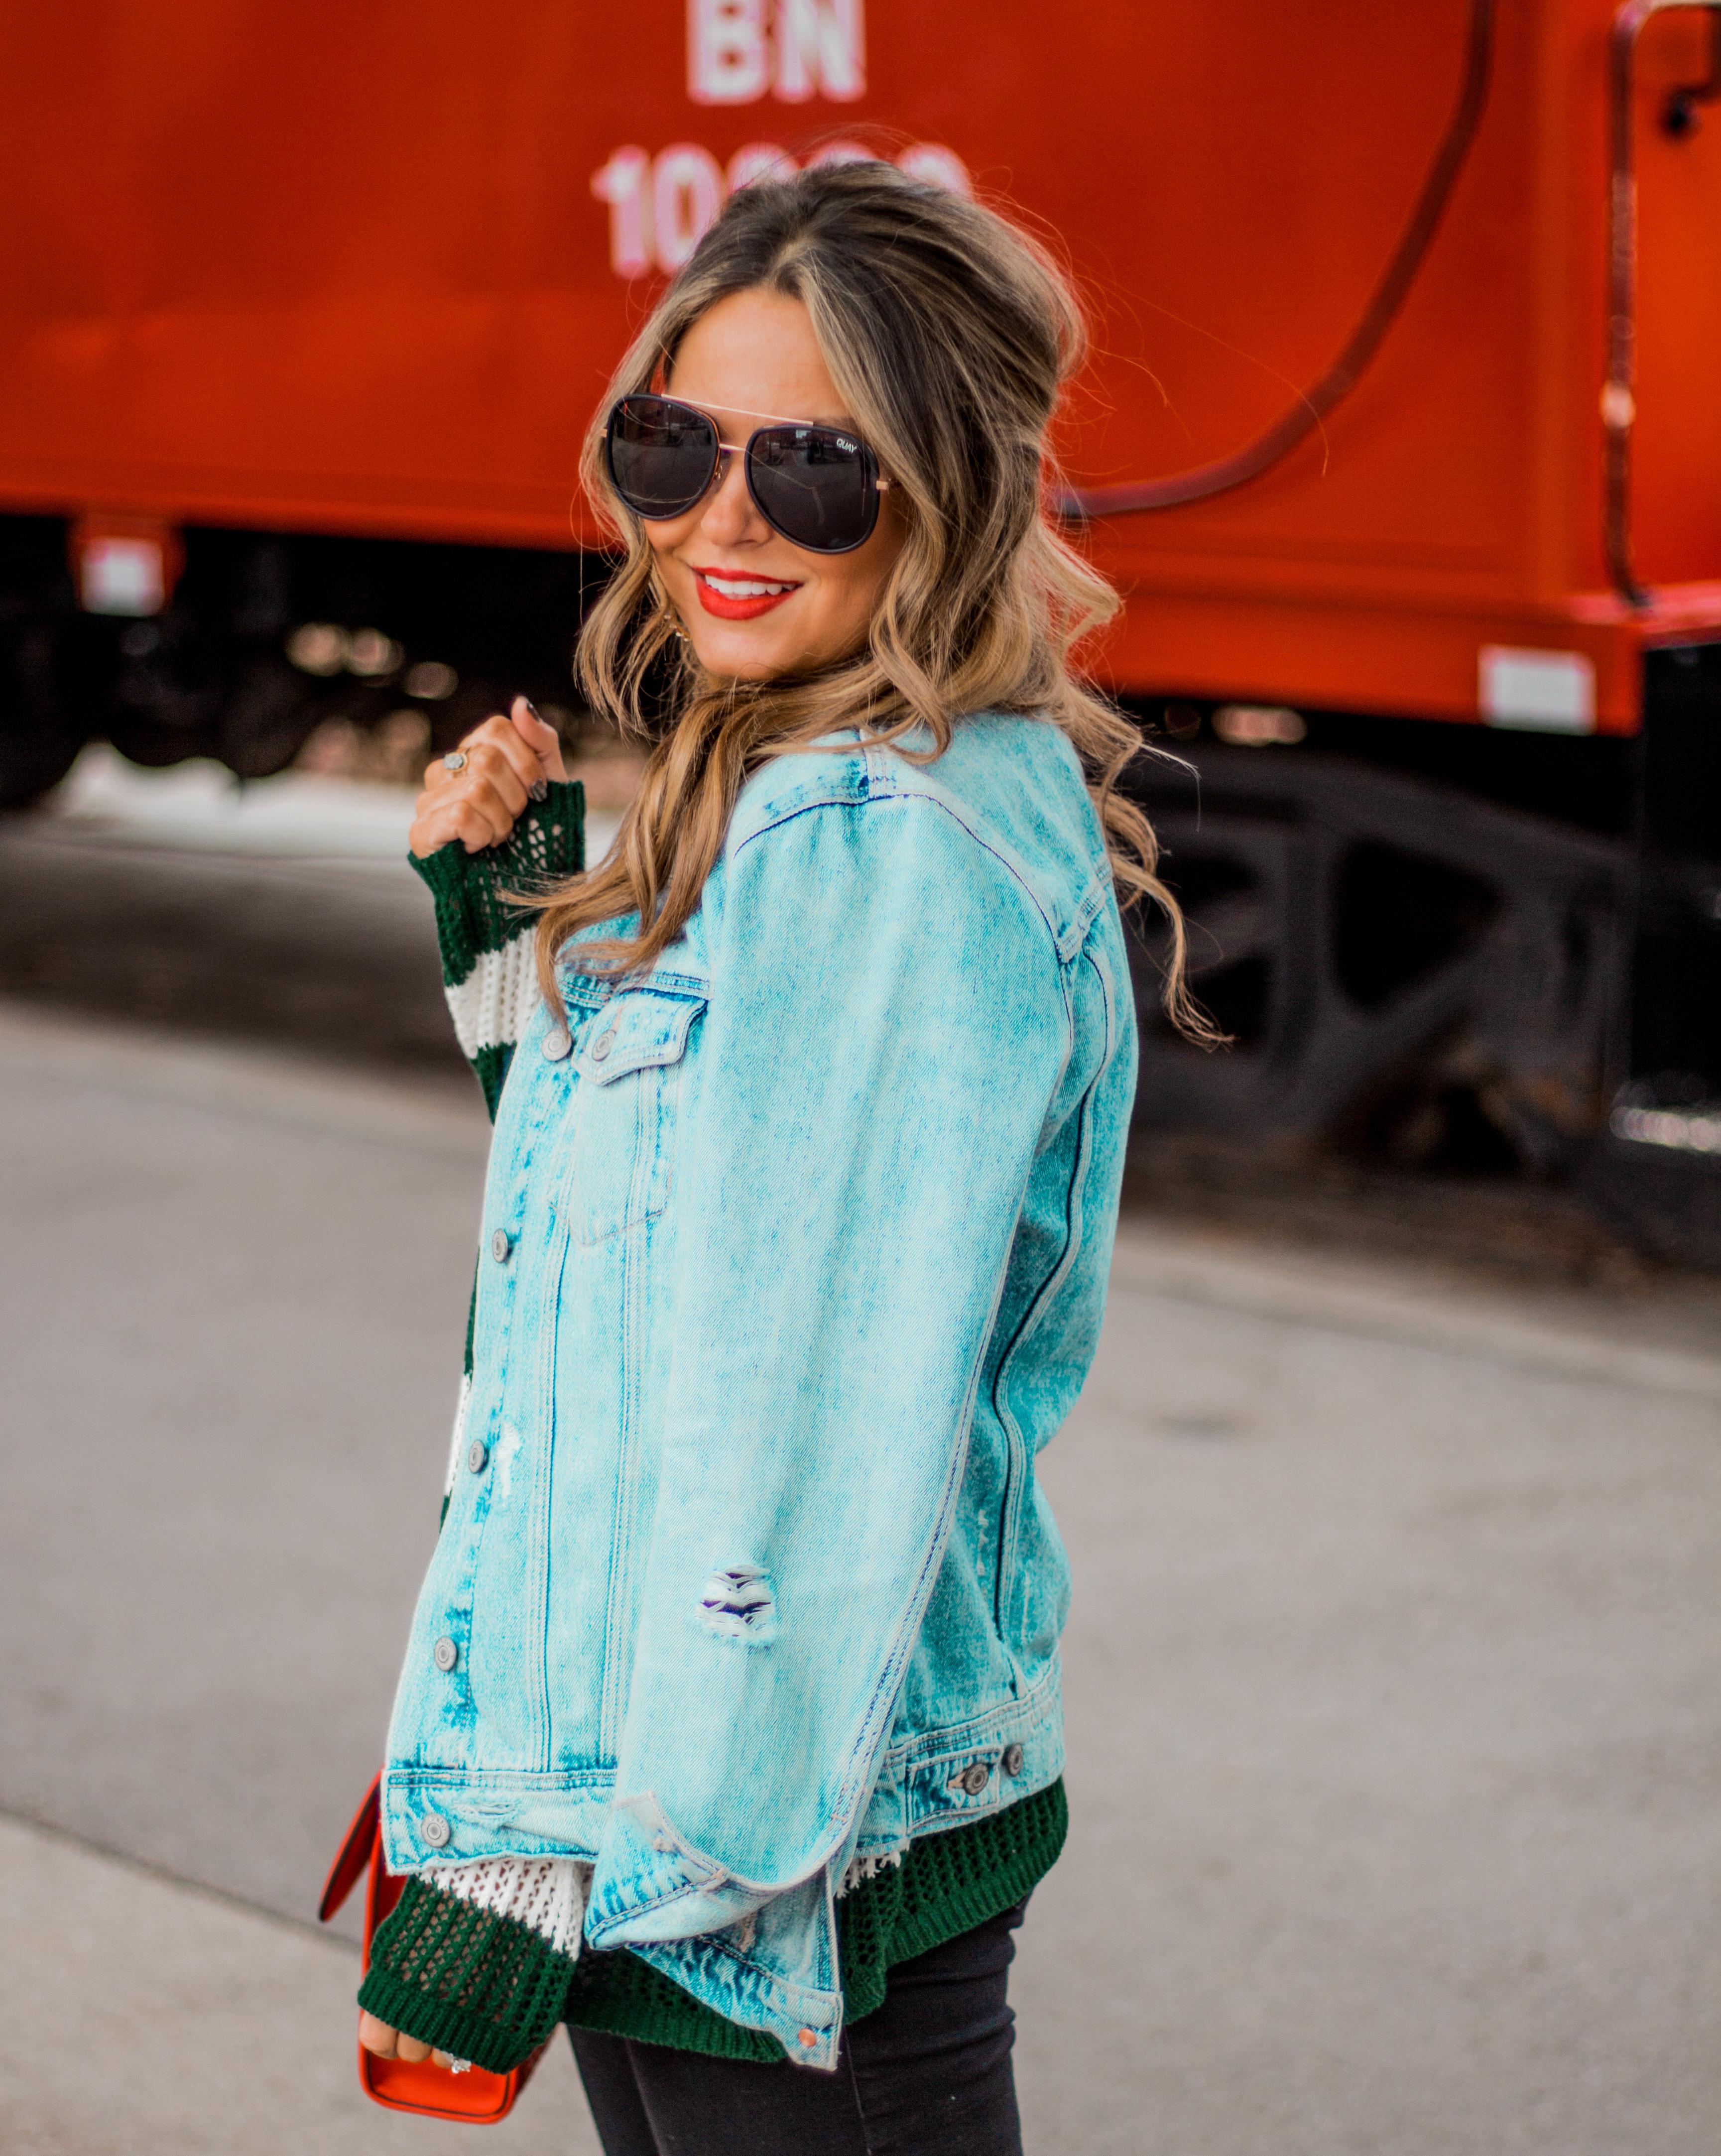 quay sunglasses, old navy jean jacket